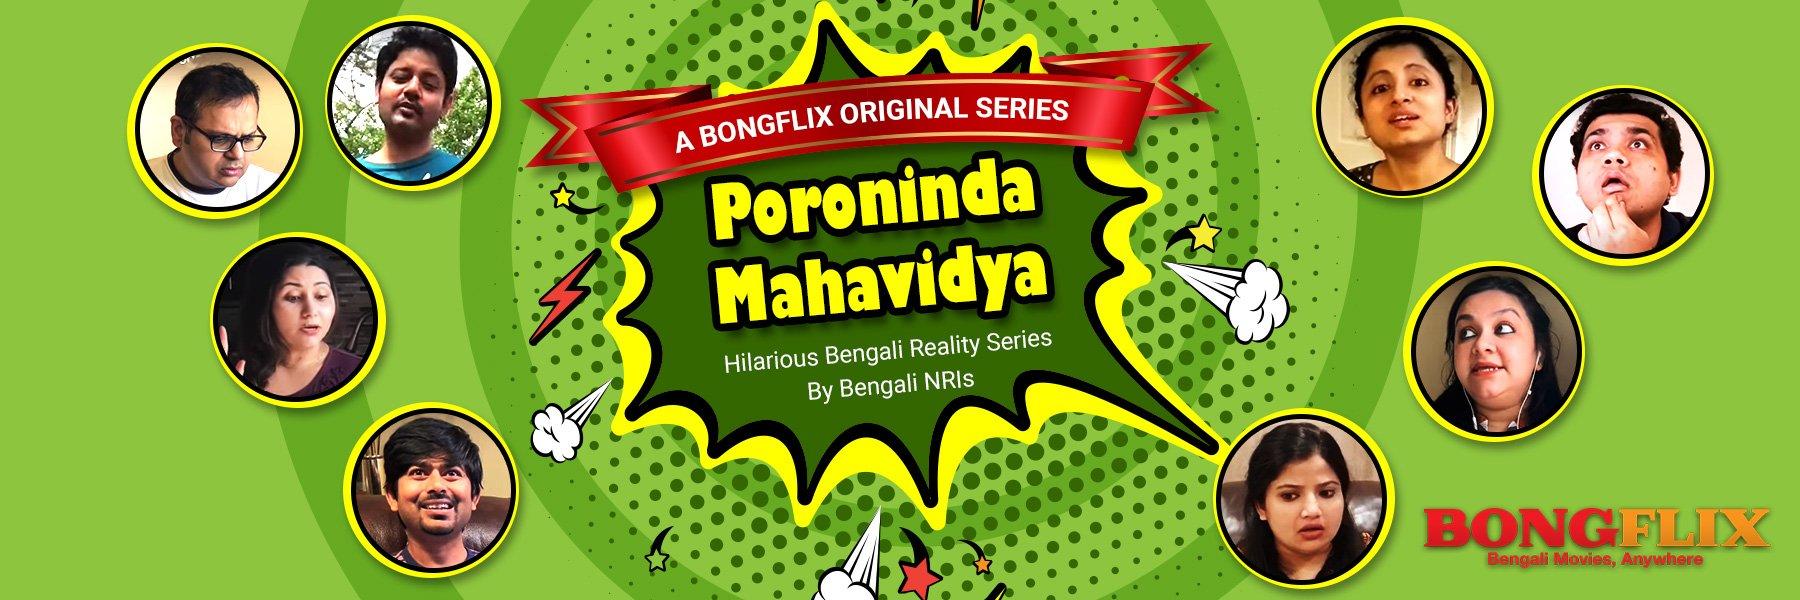 Poroninda Mahavidya